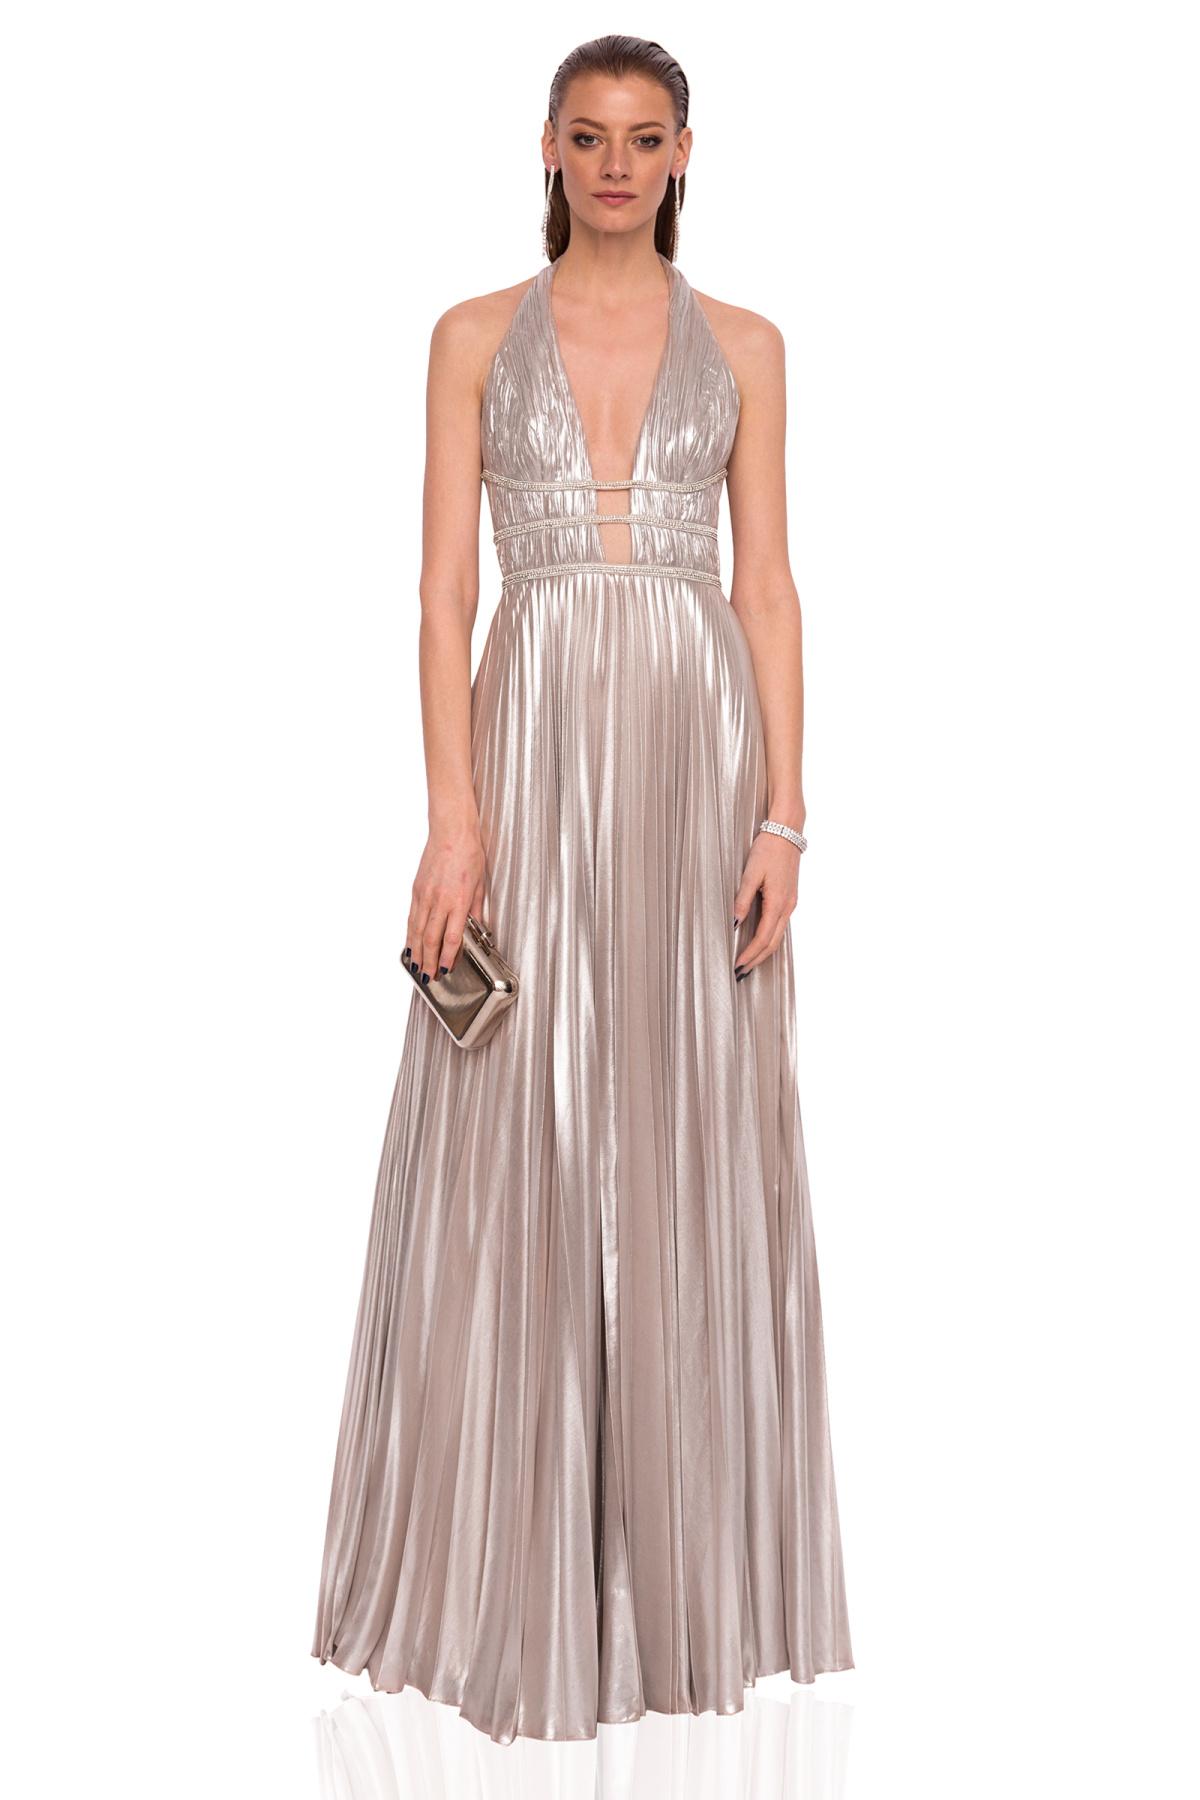 913d591ae64 Silver pleated dress with deep cut neckline | rs9628 | NISSA